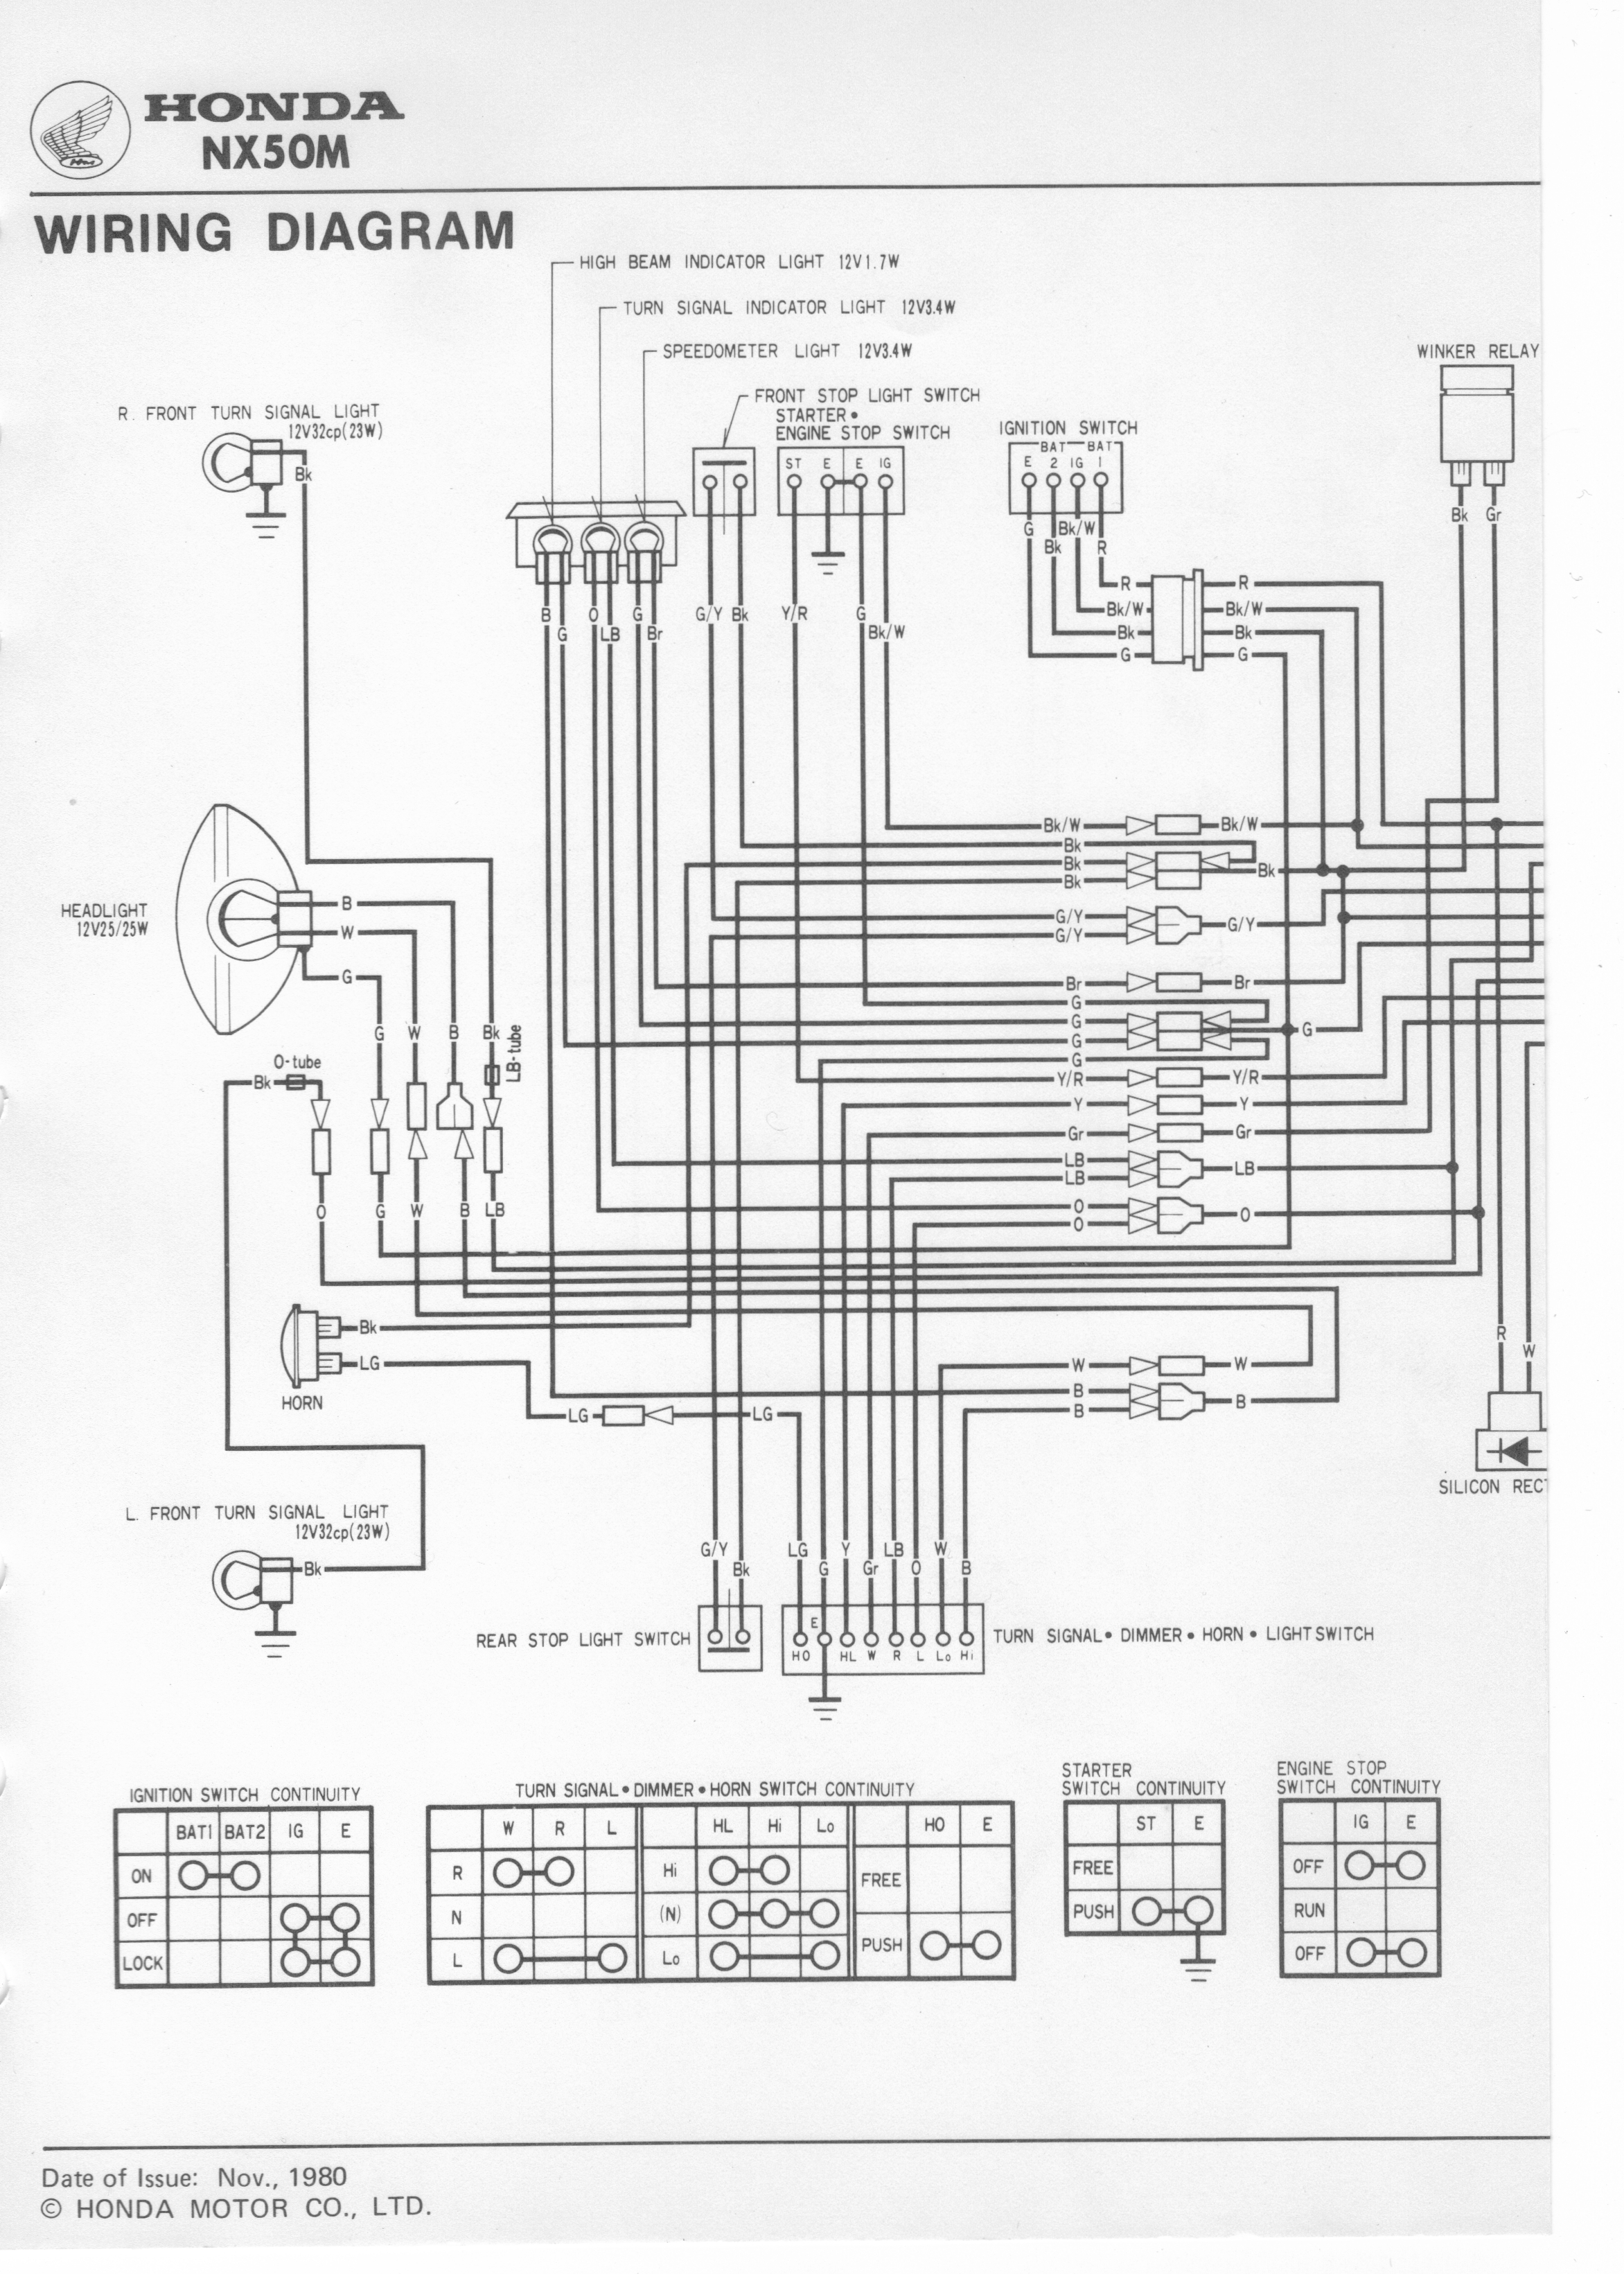 1982 Honda Vf750c Magna Wiring Diagram Database